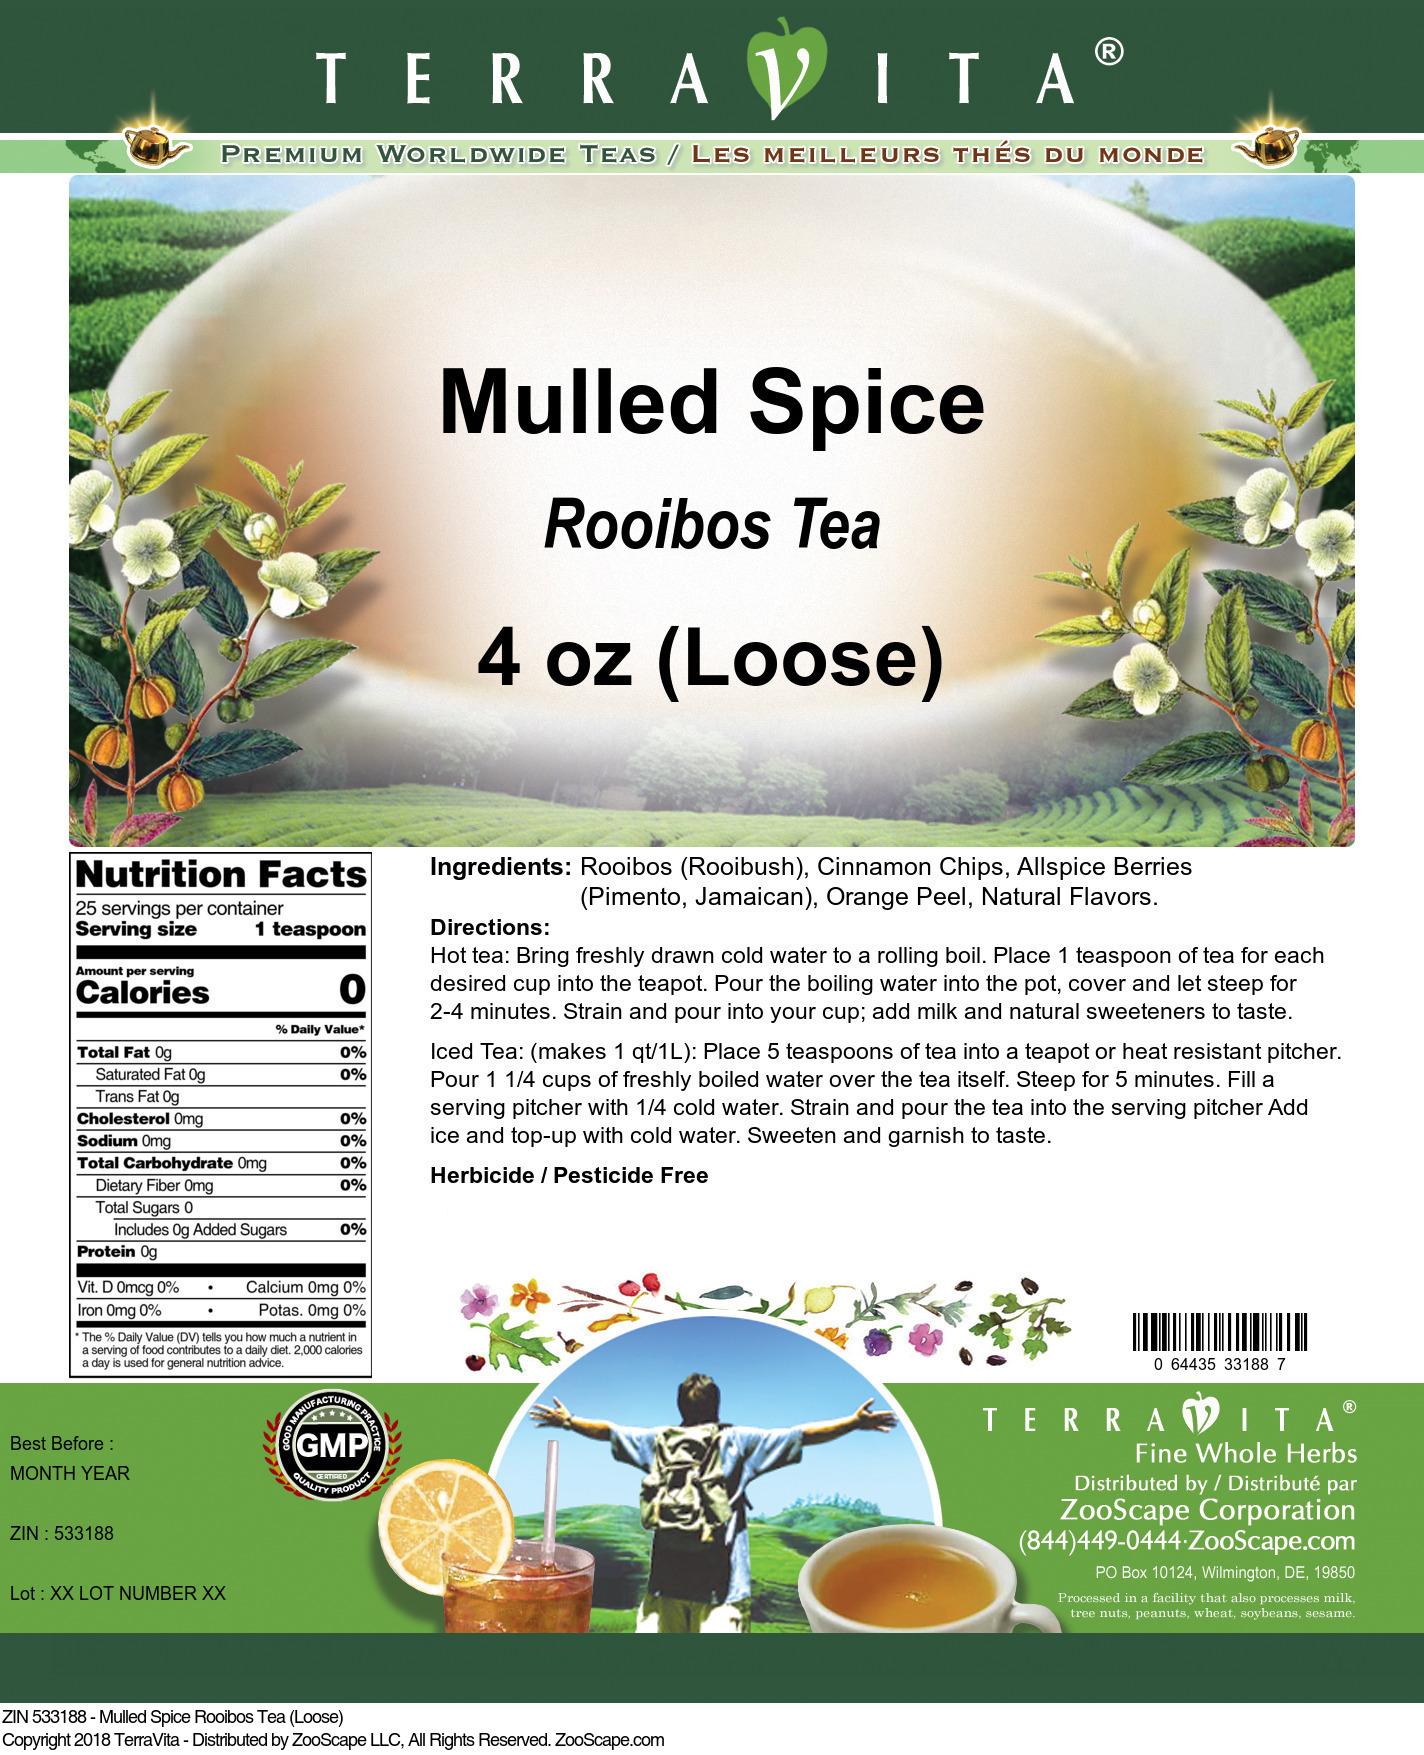 Mulled Spice Rooibos Tea